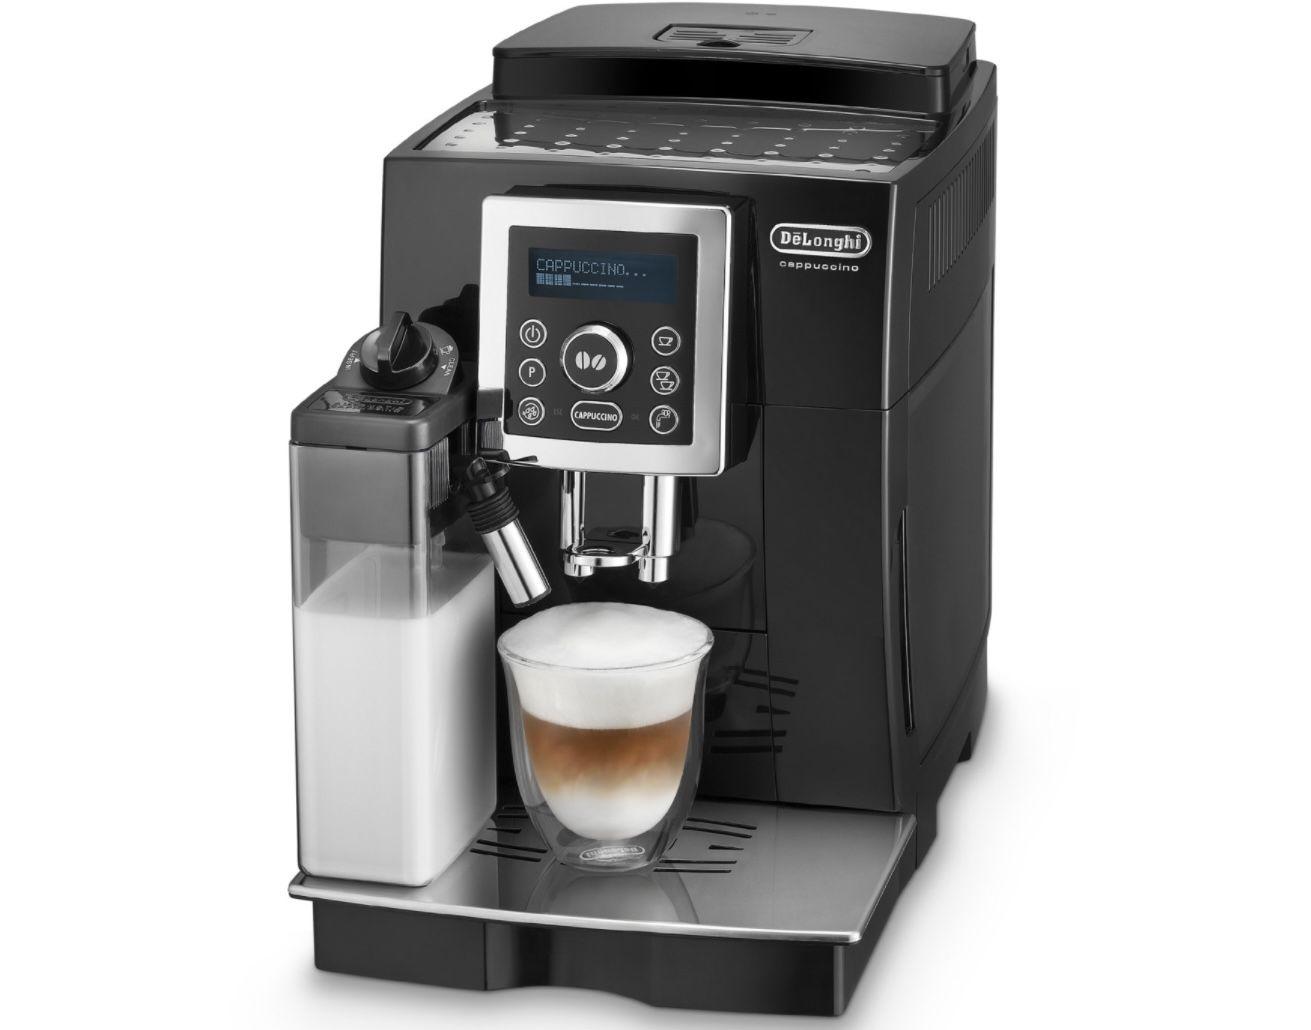 DeLonghi ECAM 23.466.B Kaffeevollautomat für 403,99€ (statt 465€)